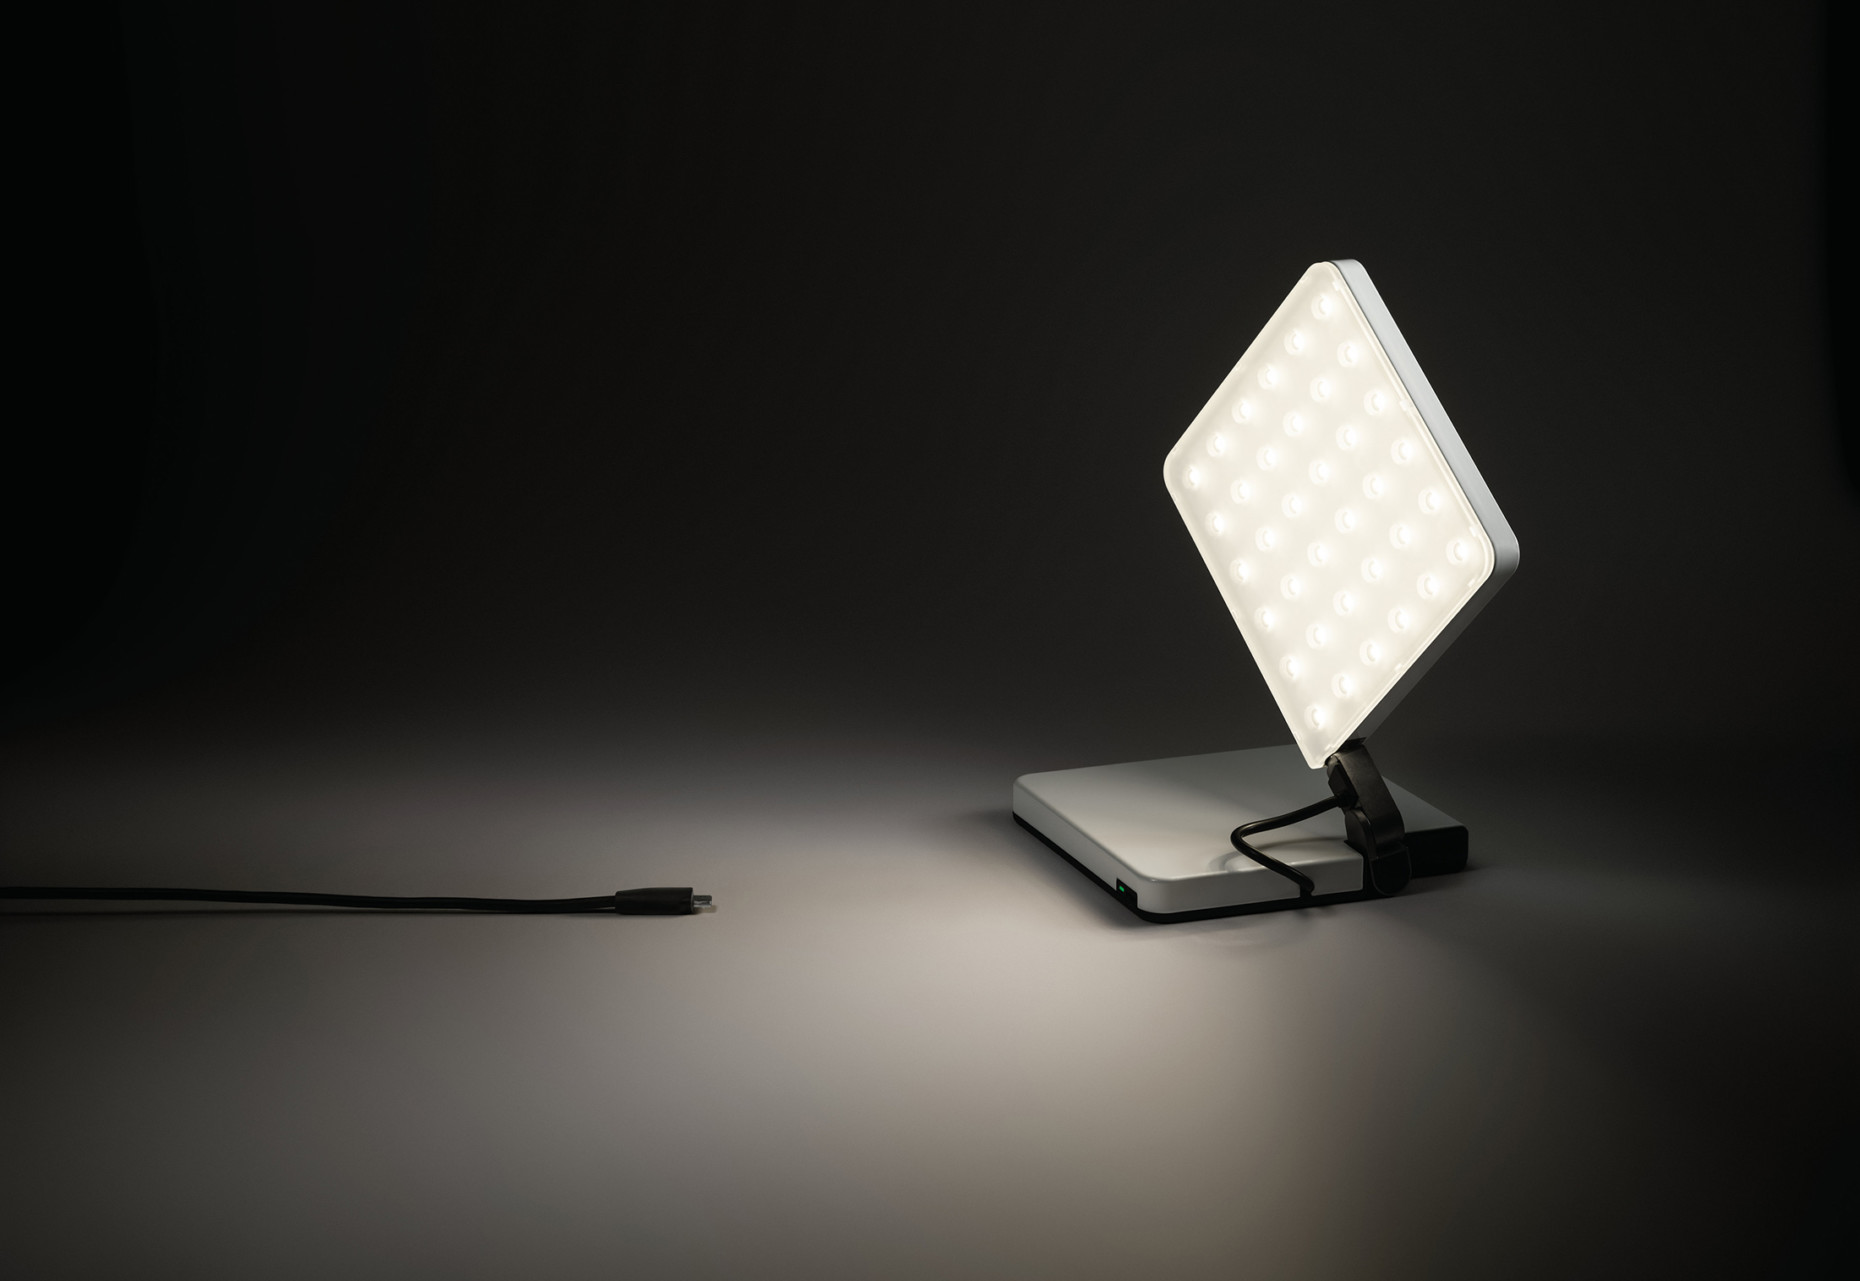 Menu Carrie Lamp : Carrie led portable lamp menu carrie led table lamp burned red